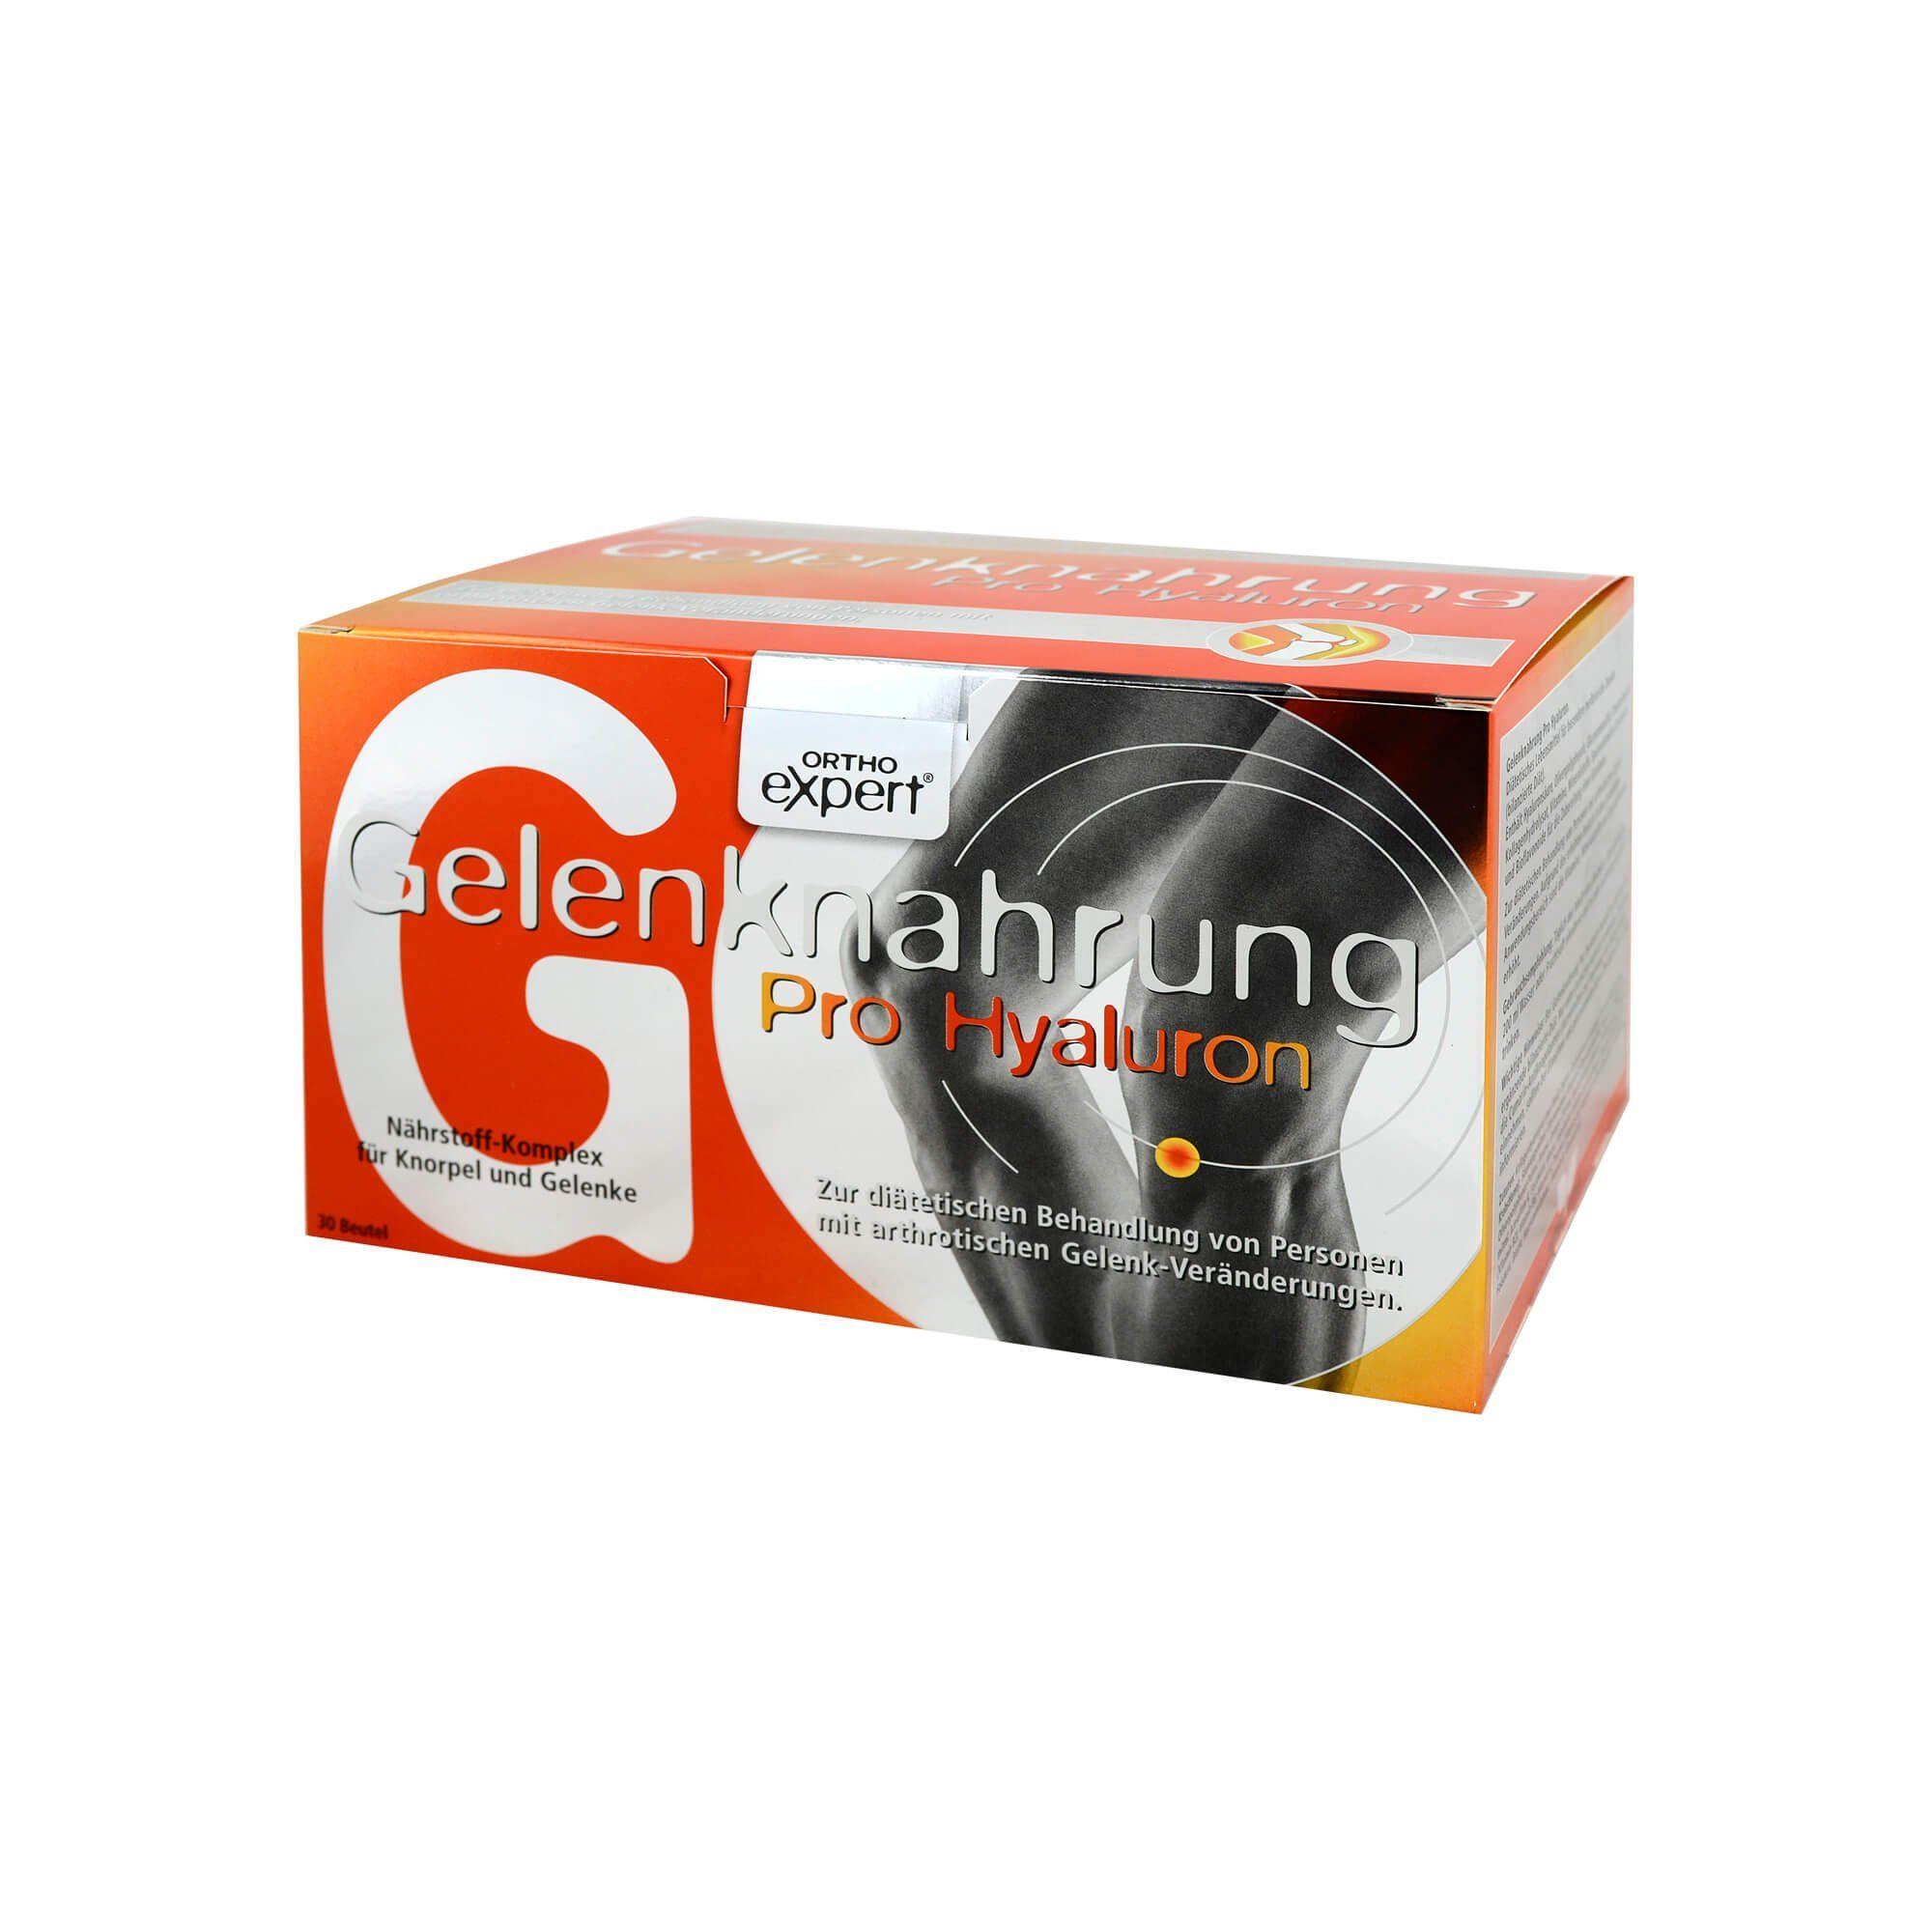 Orthoexpert Gelenknahrung Pro Hyaluron, 30X12.3 g